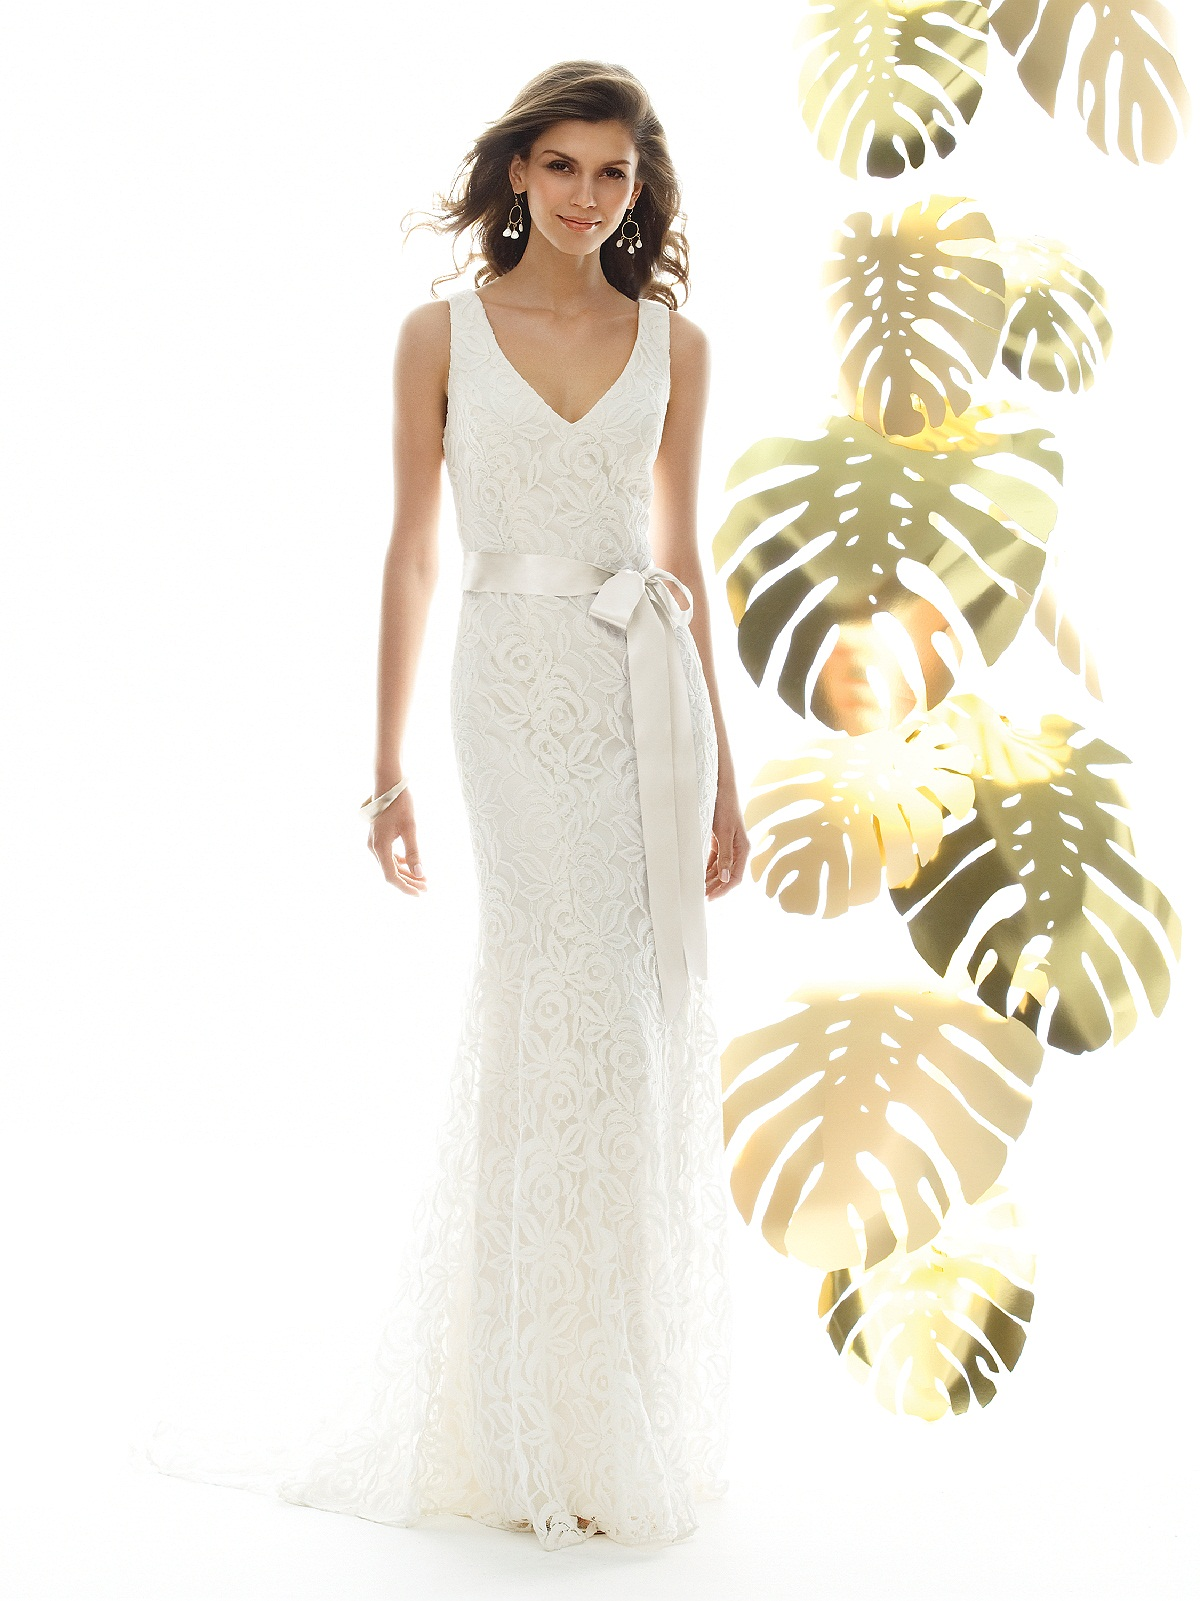 over 40 wedding dresses photo - 1